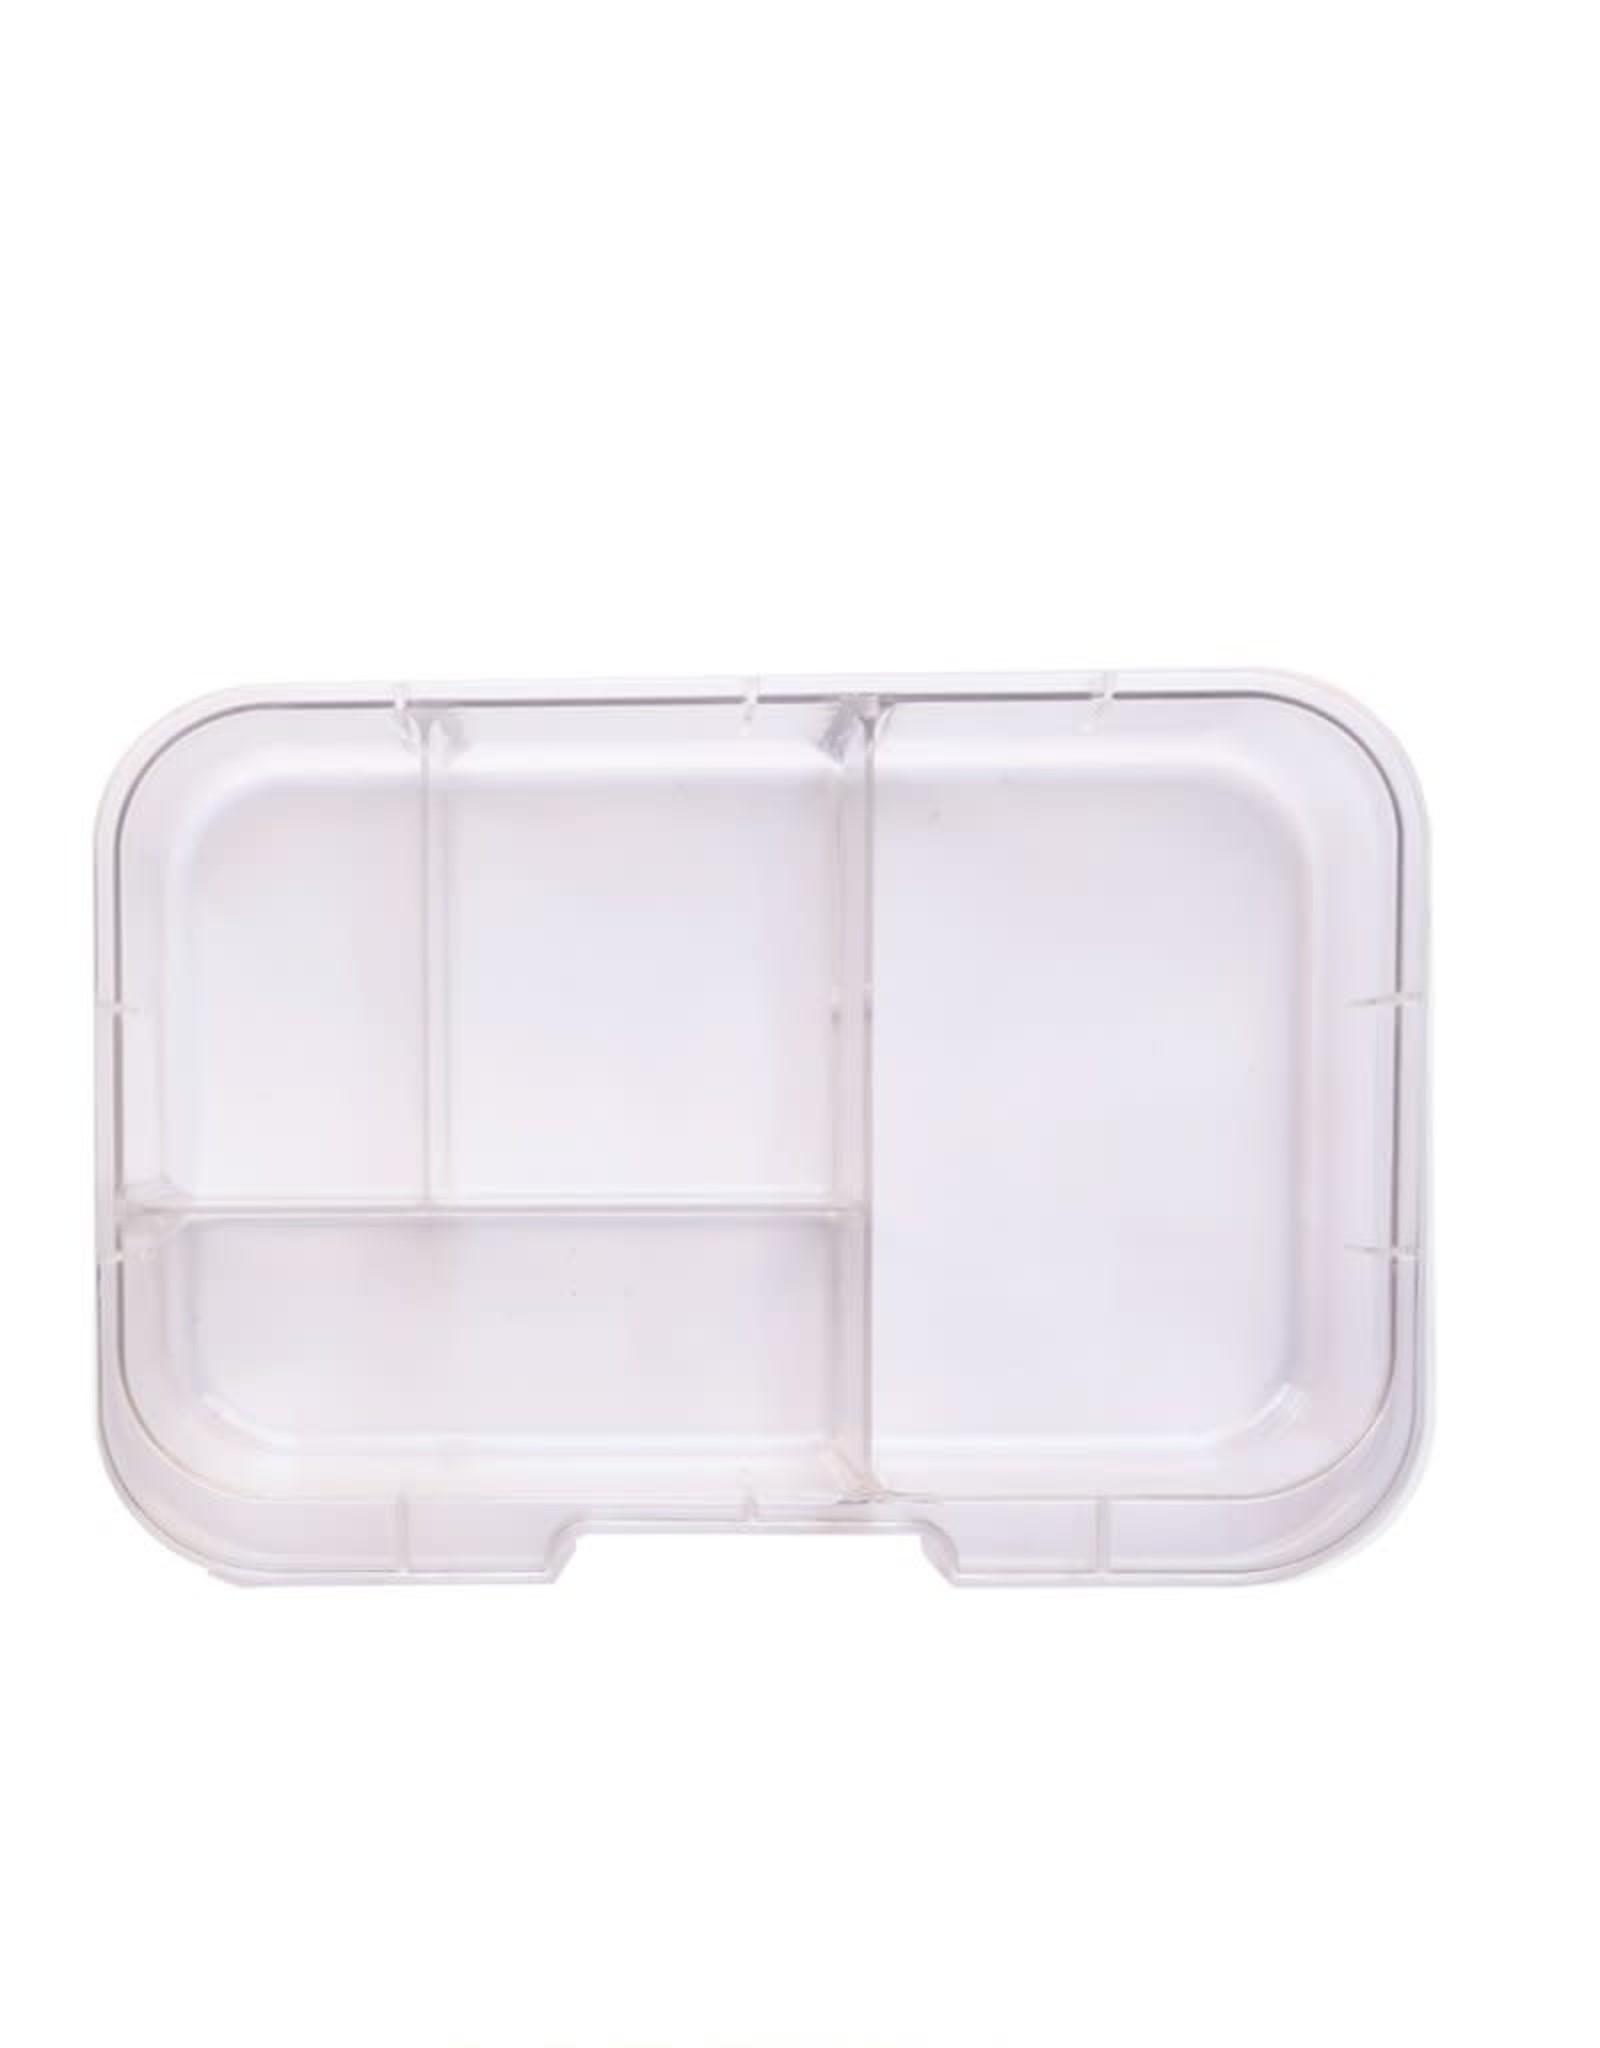 Munchbox Munchbox Bento Mega 4 - Clear Tray